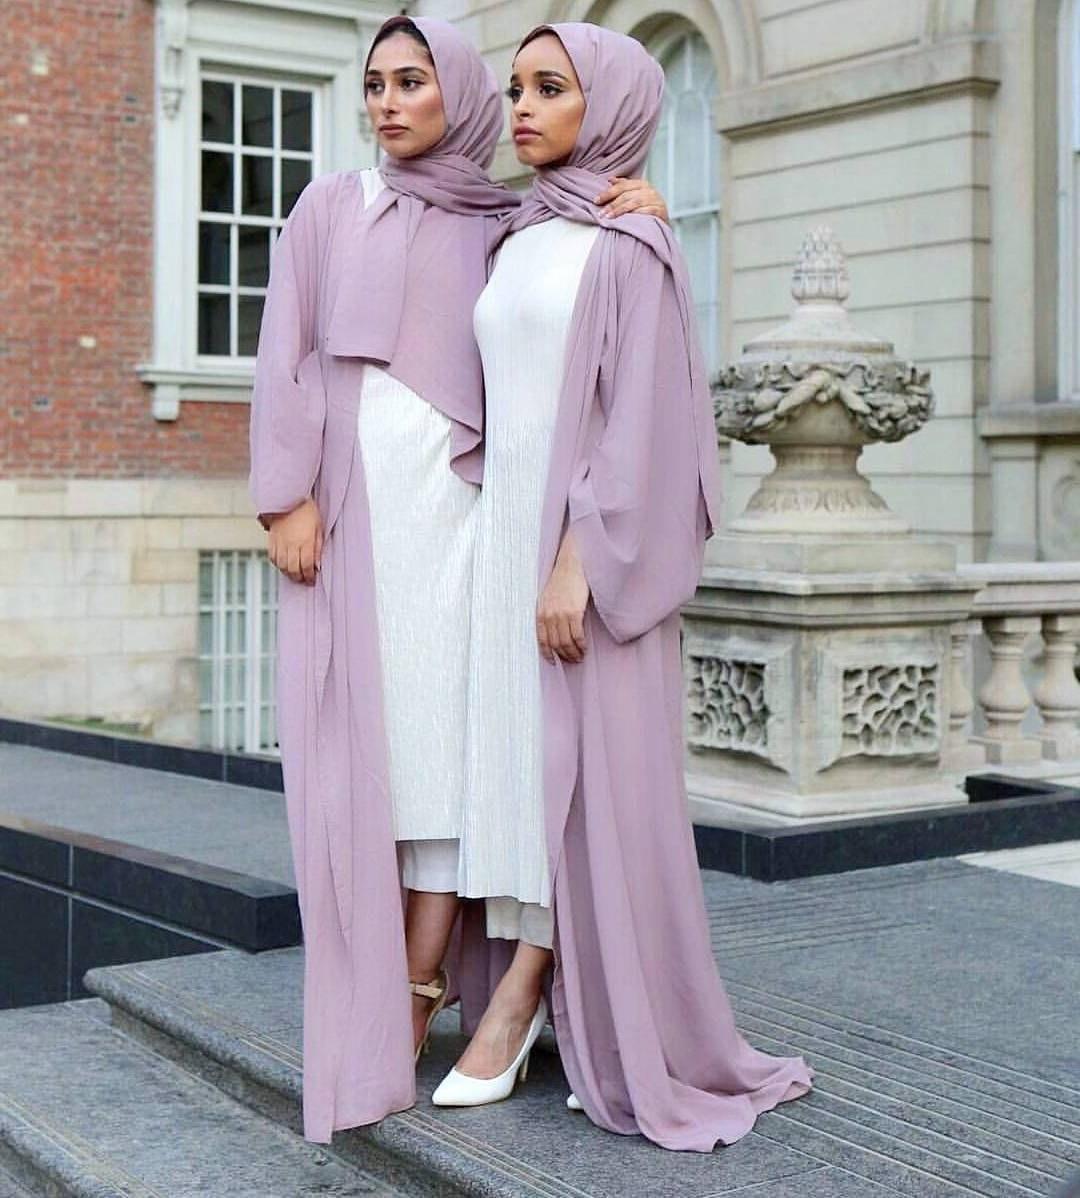 Inspirasi Lihat Model Baju Lebaran 2018 Budm 50 Model Baju Lebaran Terbaru 2018 Modern & Elegan